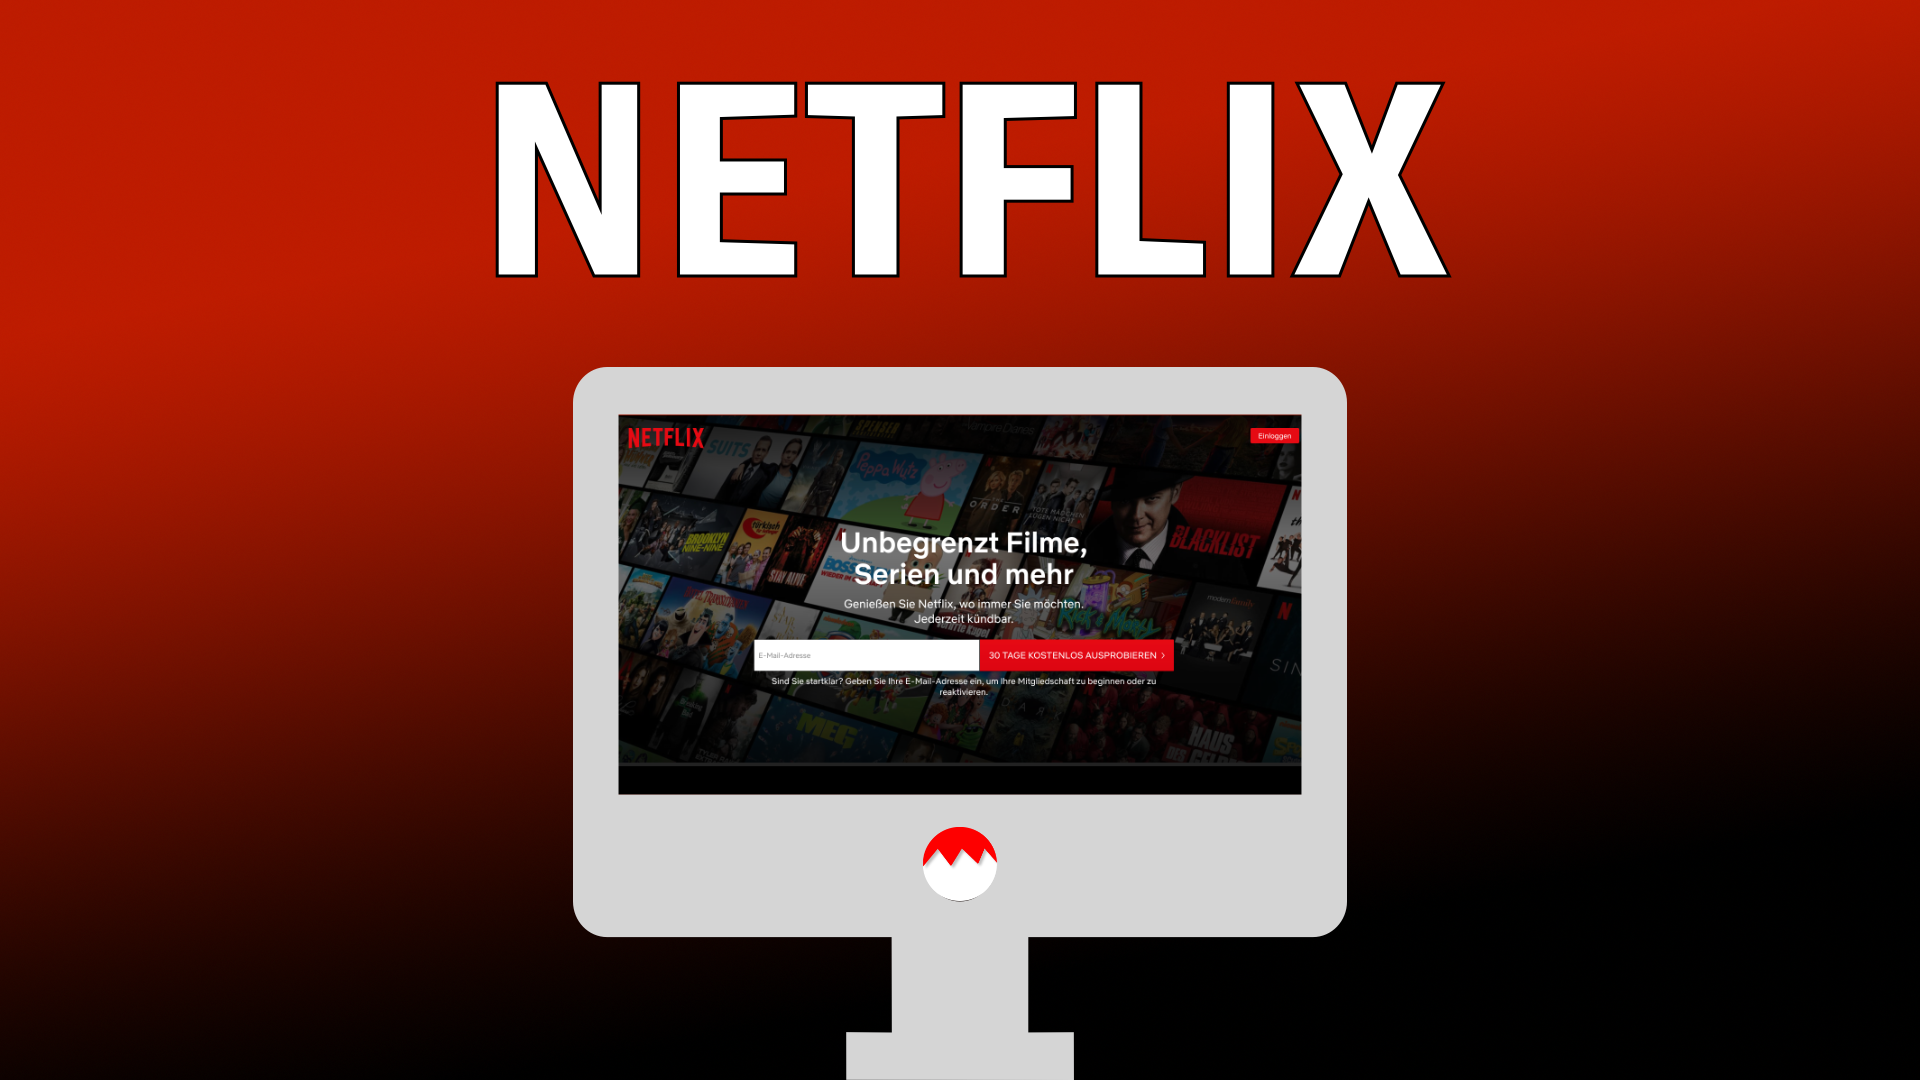 Netflix Abo Teilen